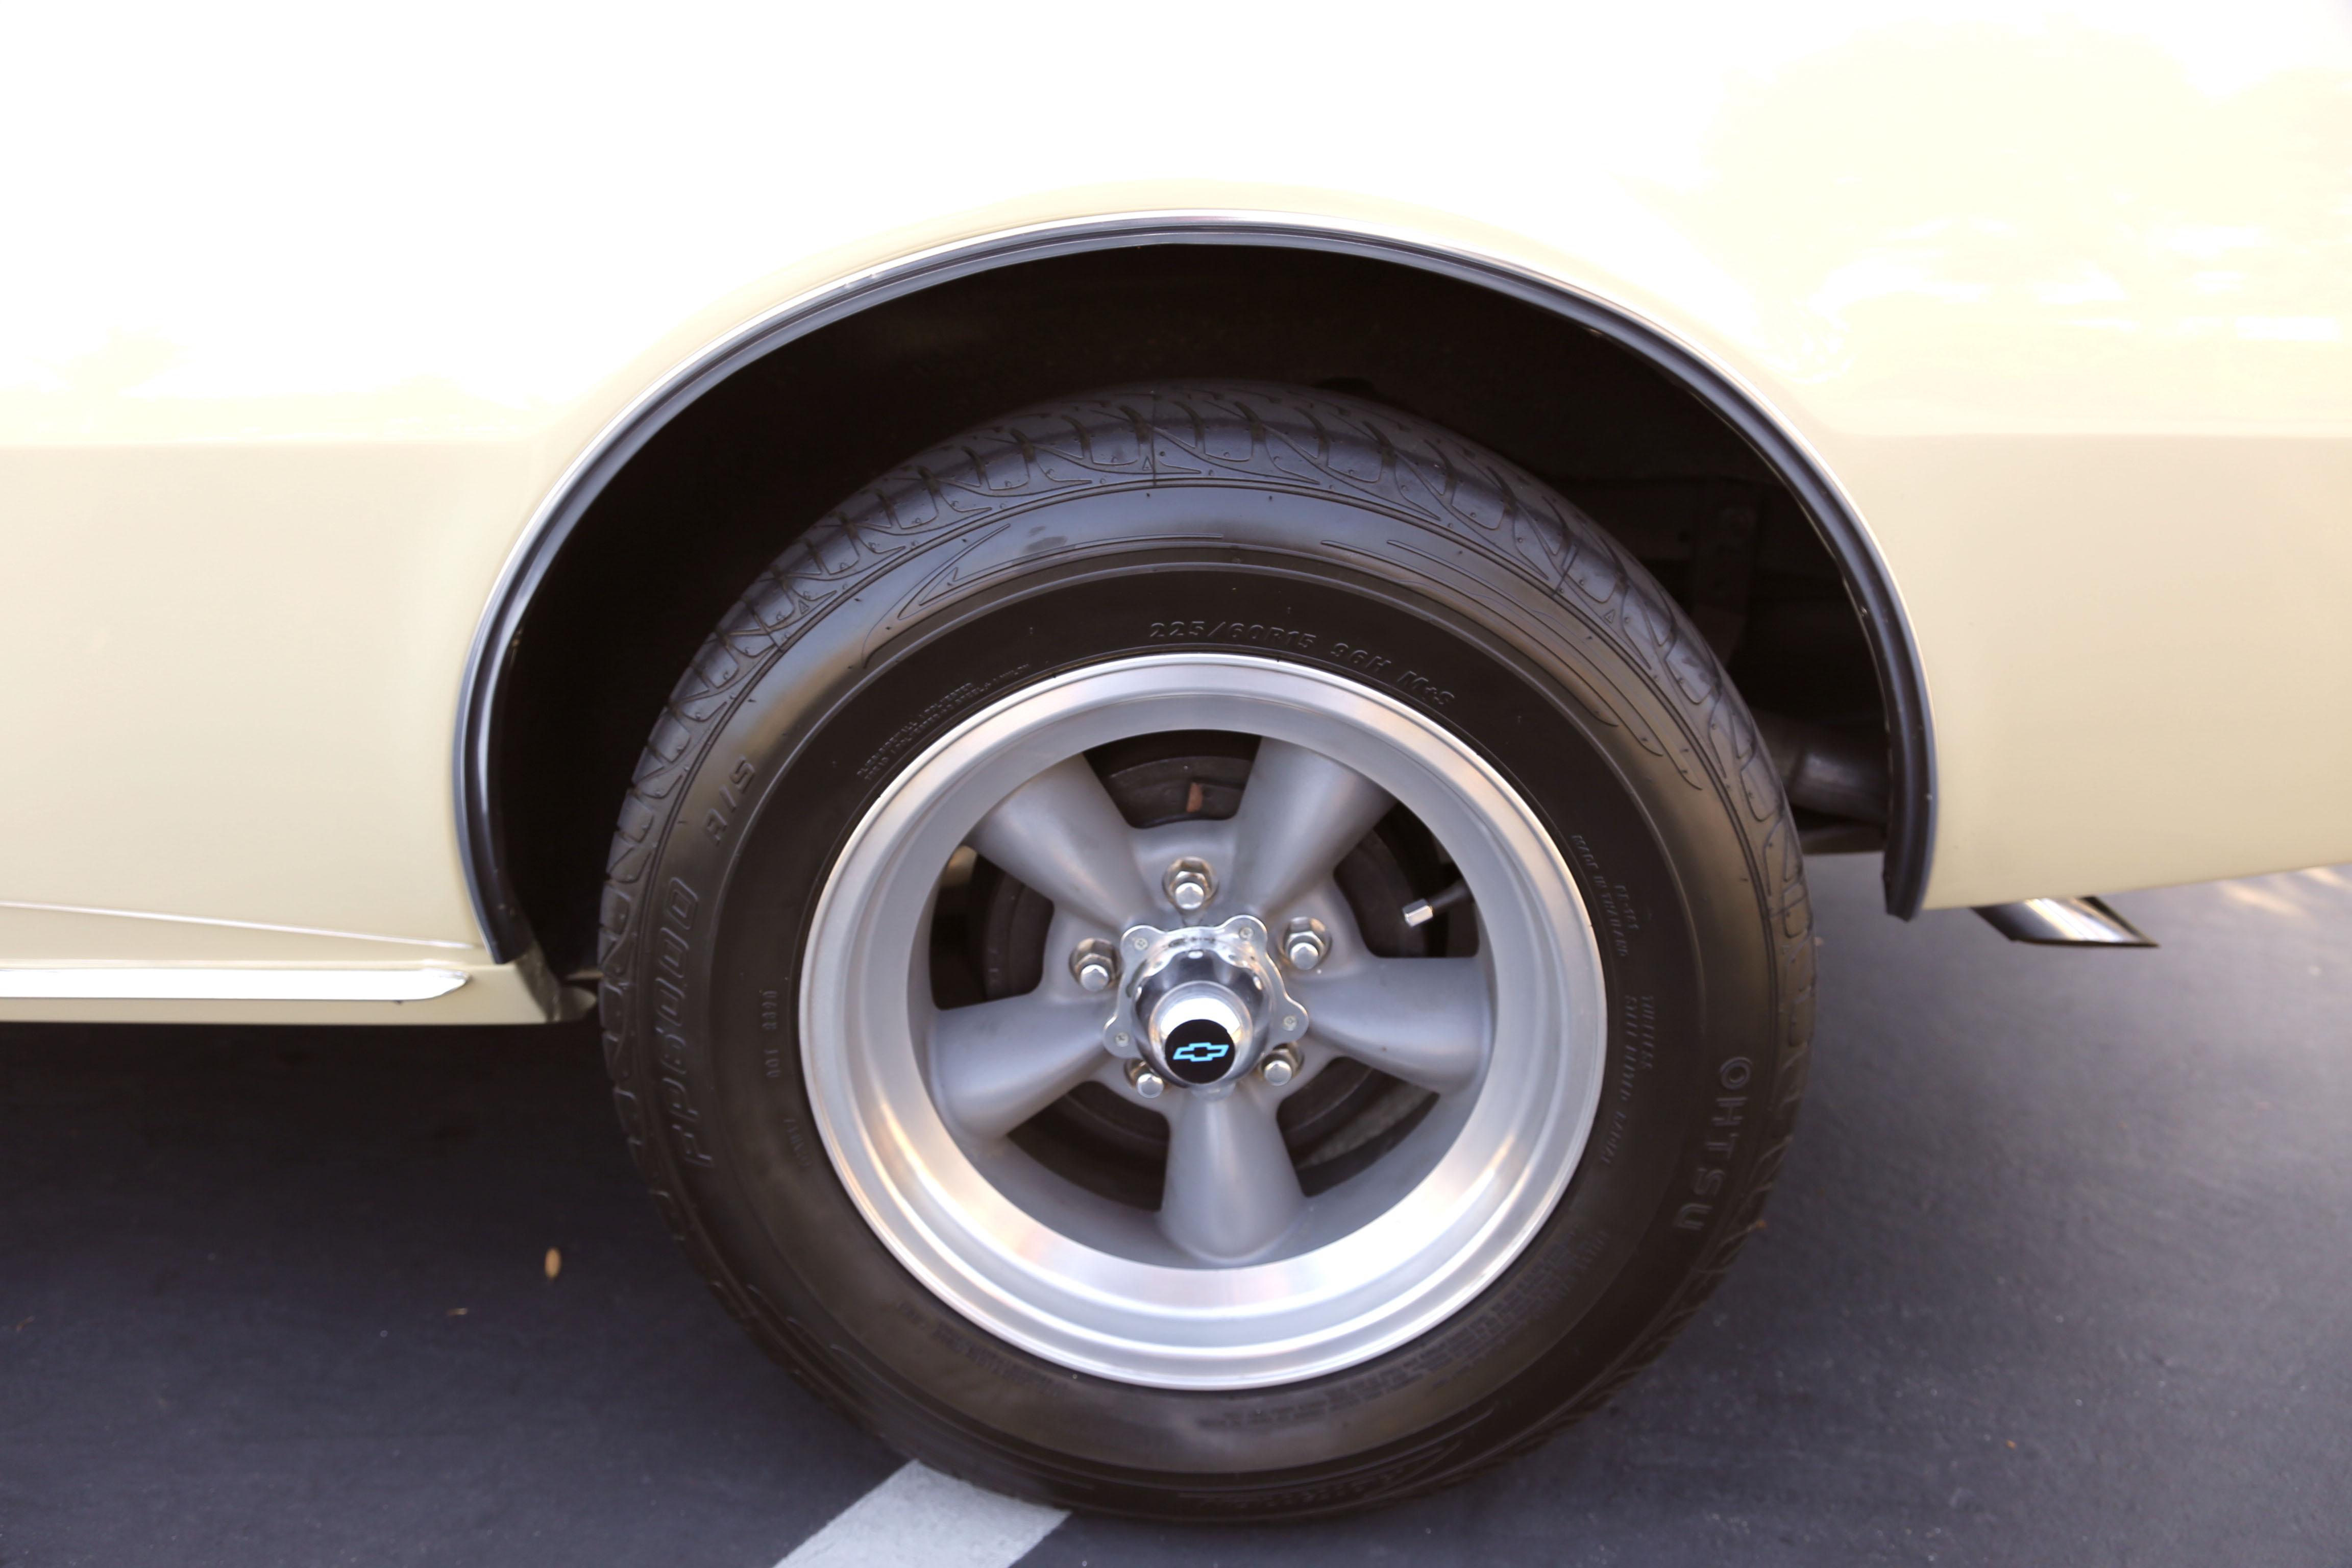 1968 Camaro Odd Options Wheels